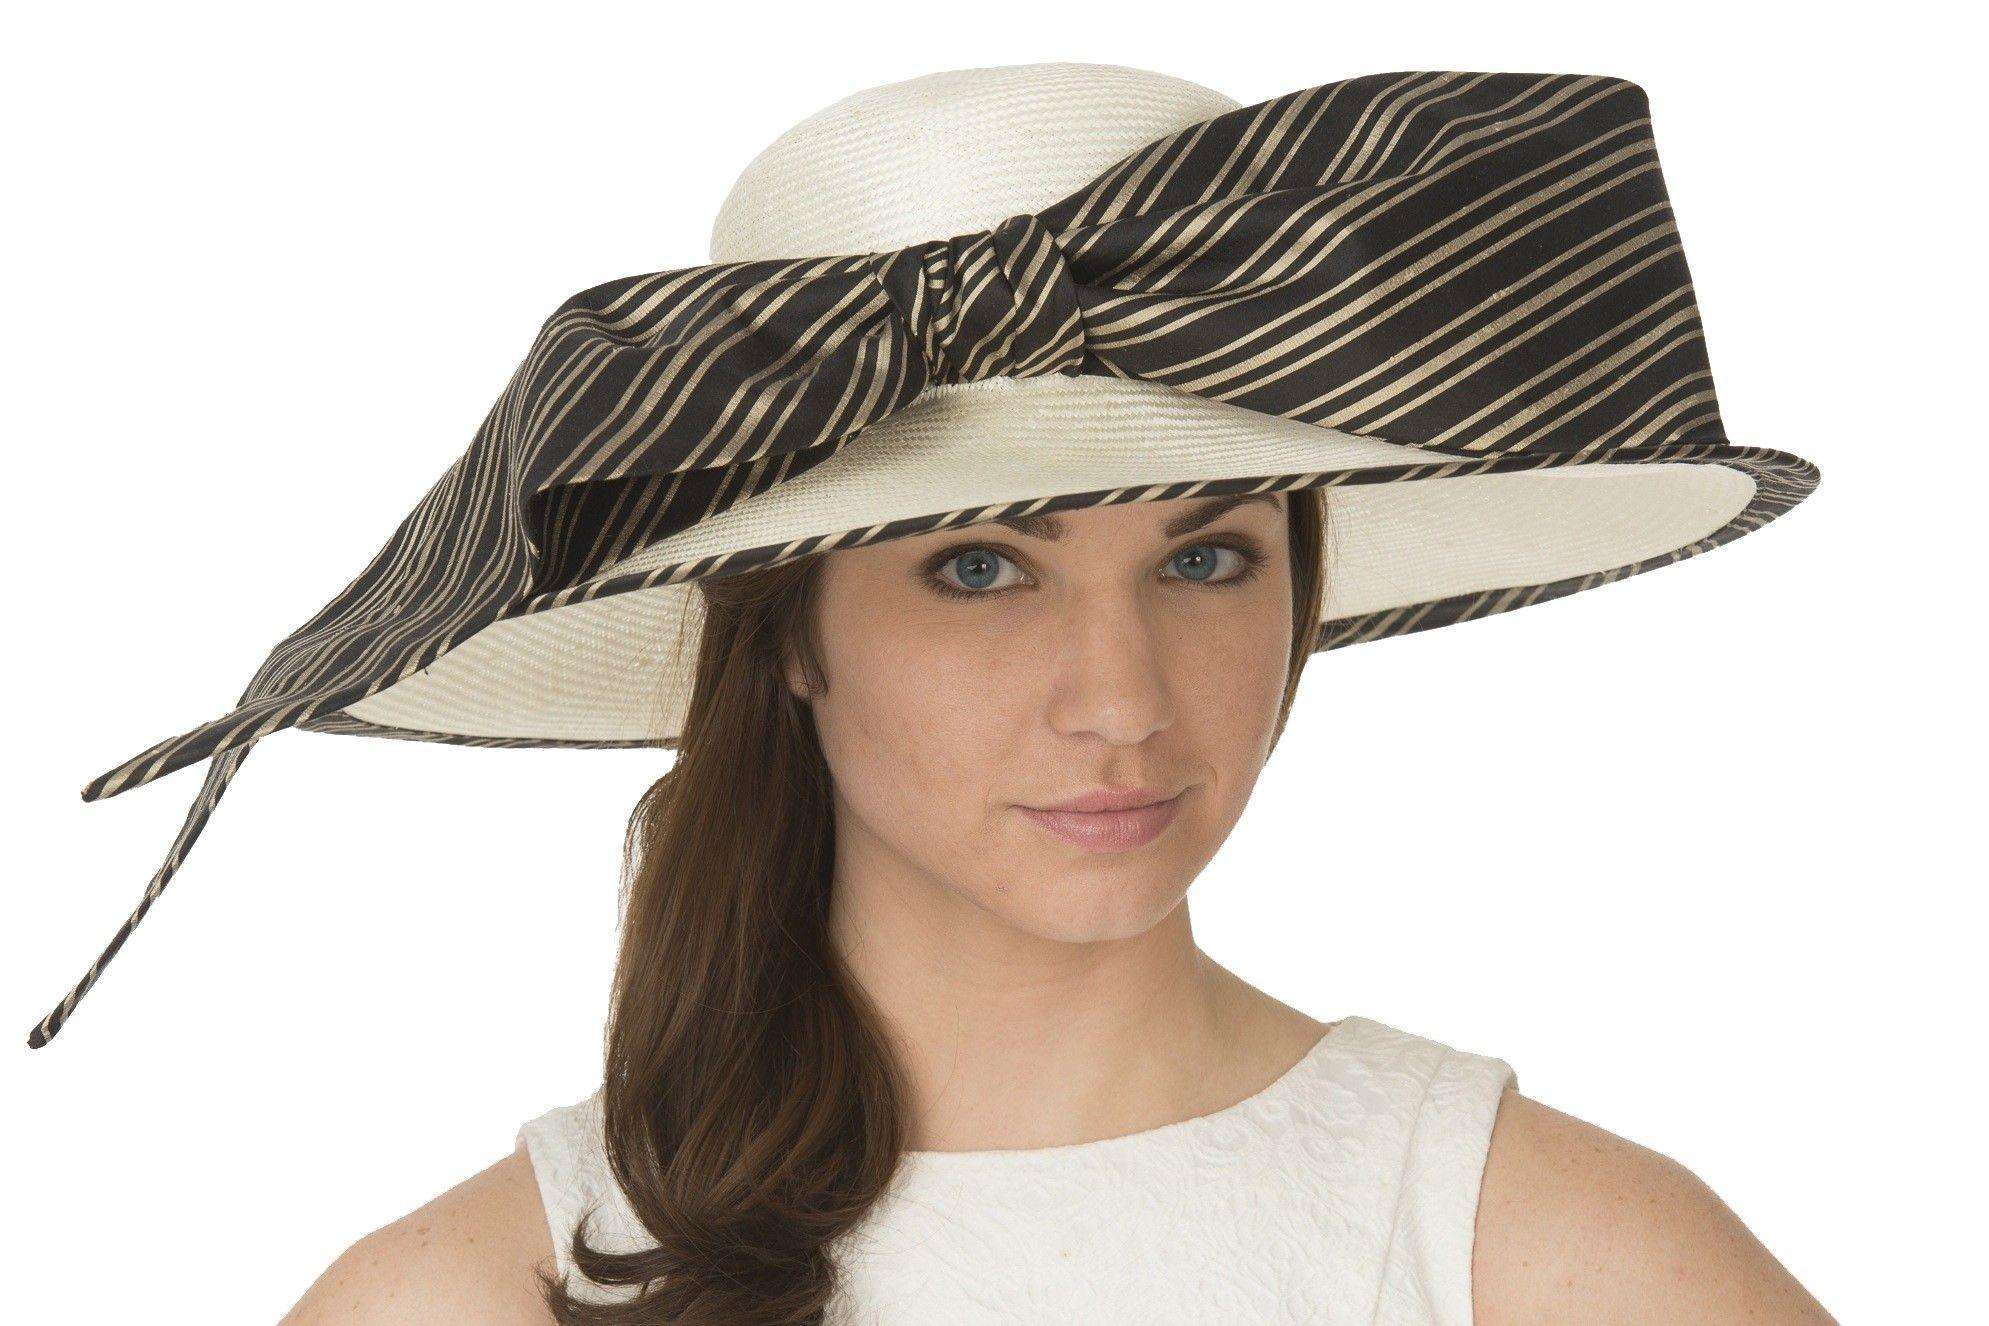 b9b5ec847fd Christine a moore jennifer parisisol big brim derby hats jpg 1989x1326 Christine  hats